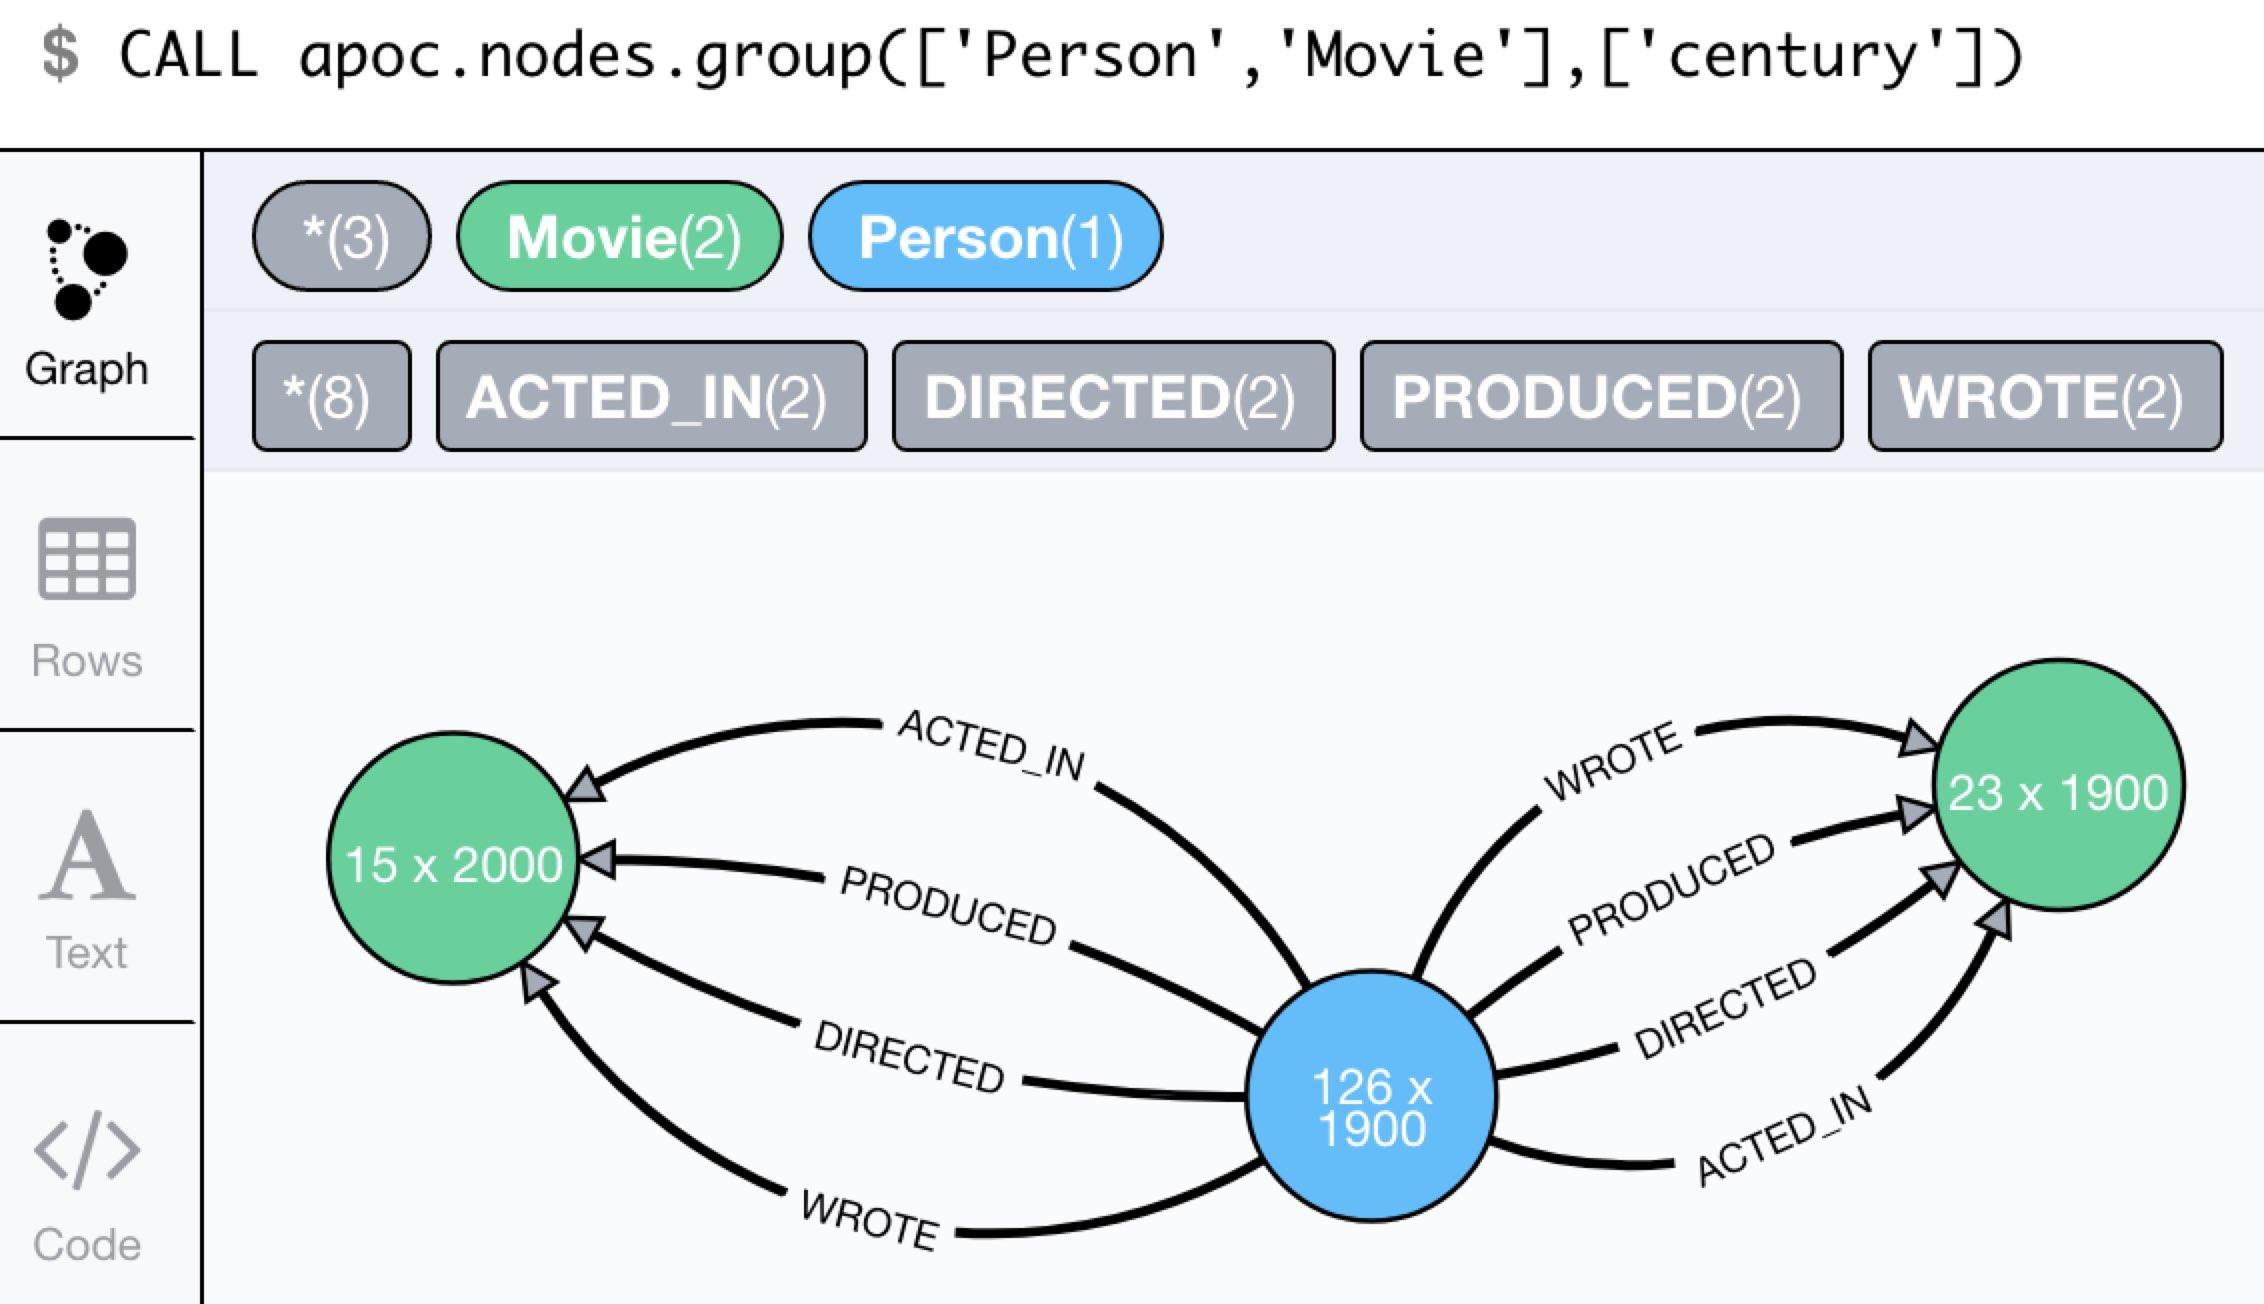 apoc.nodes.group